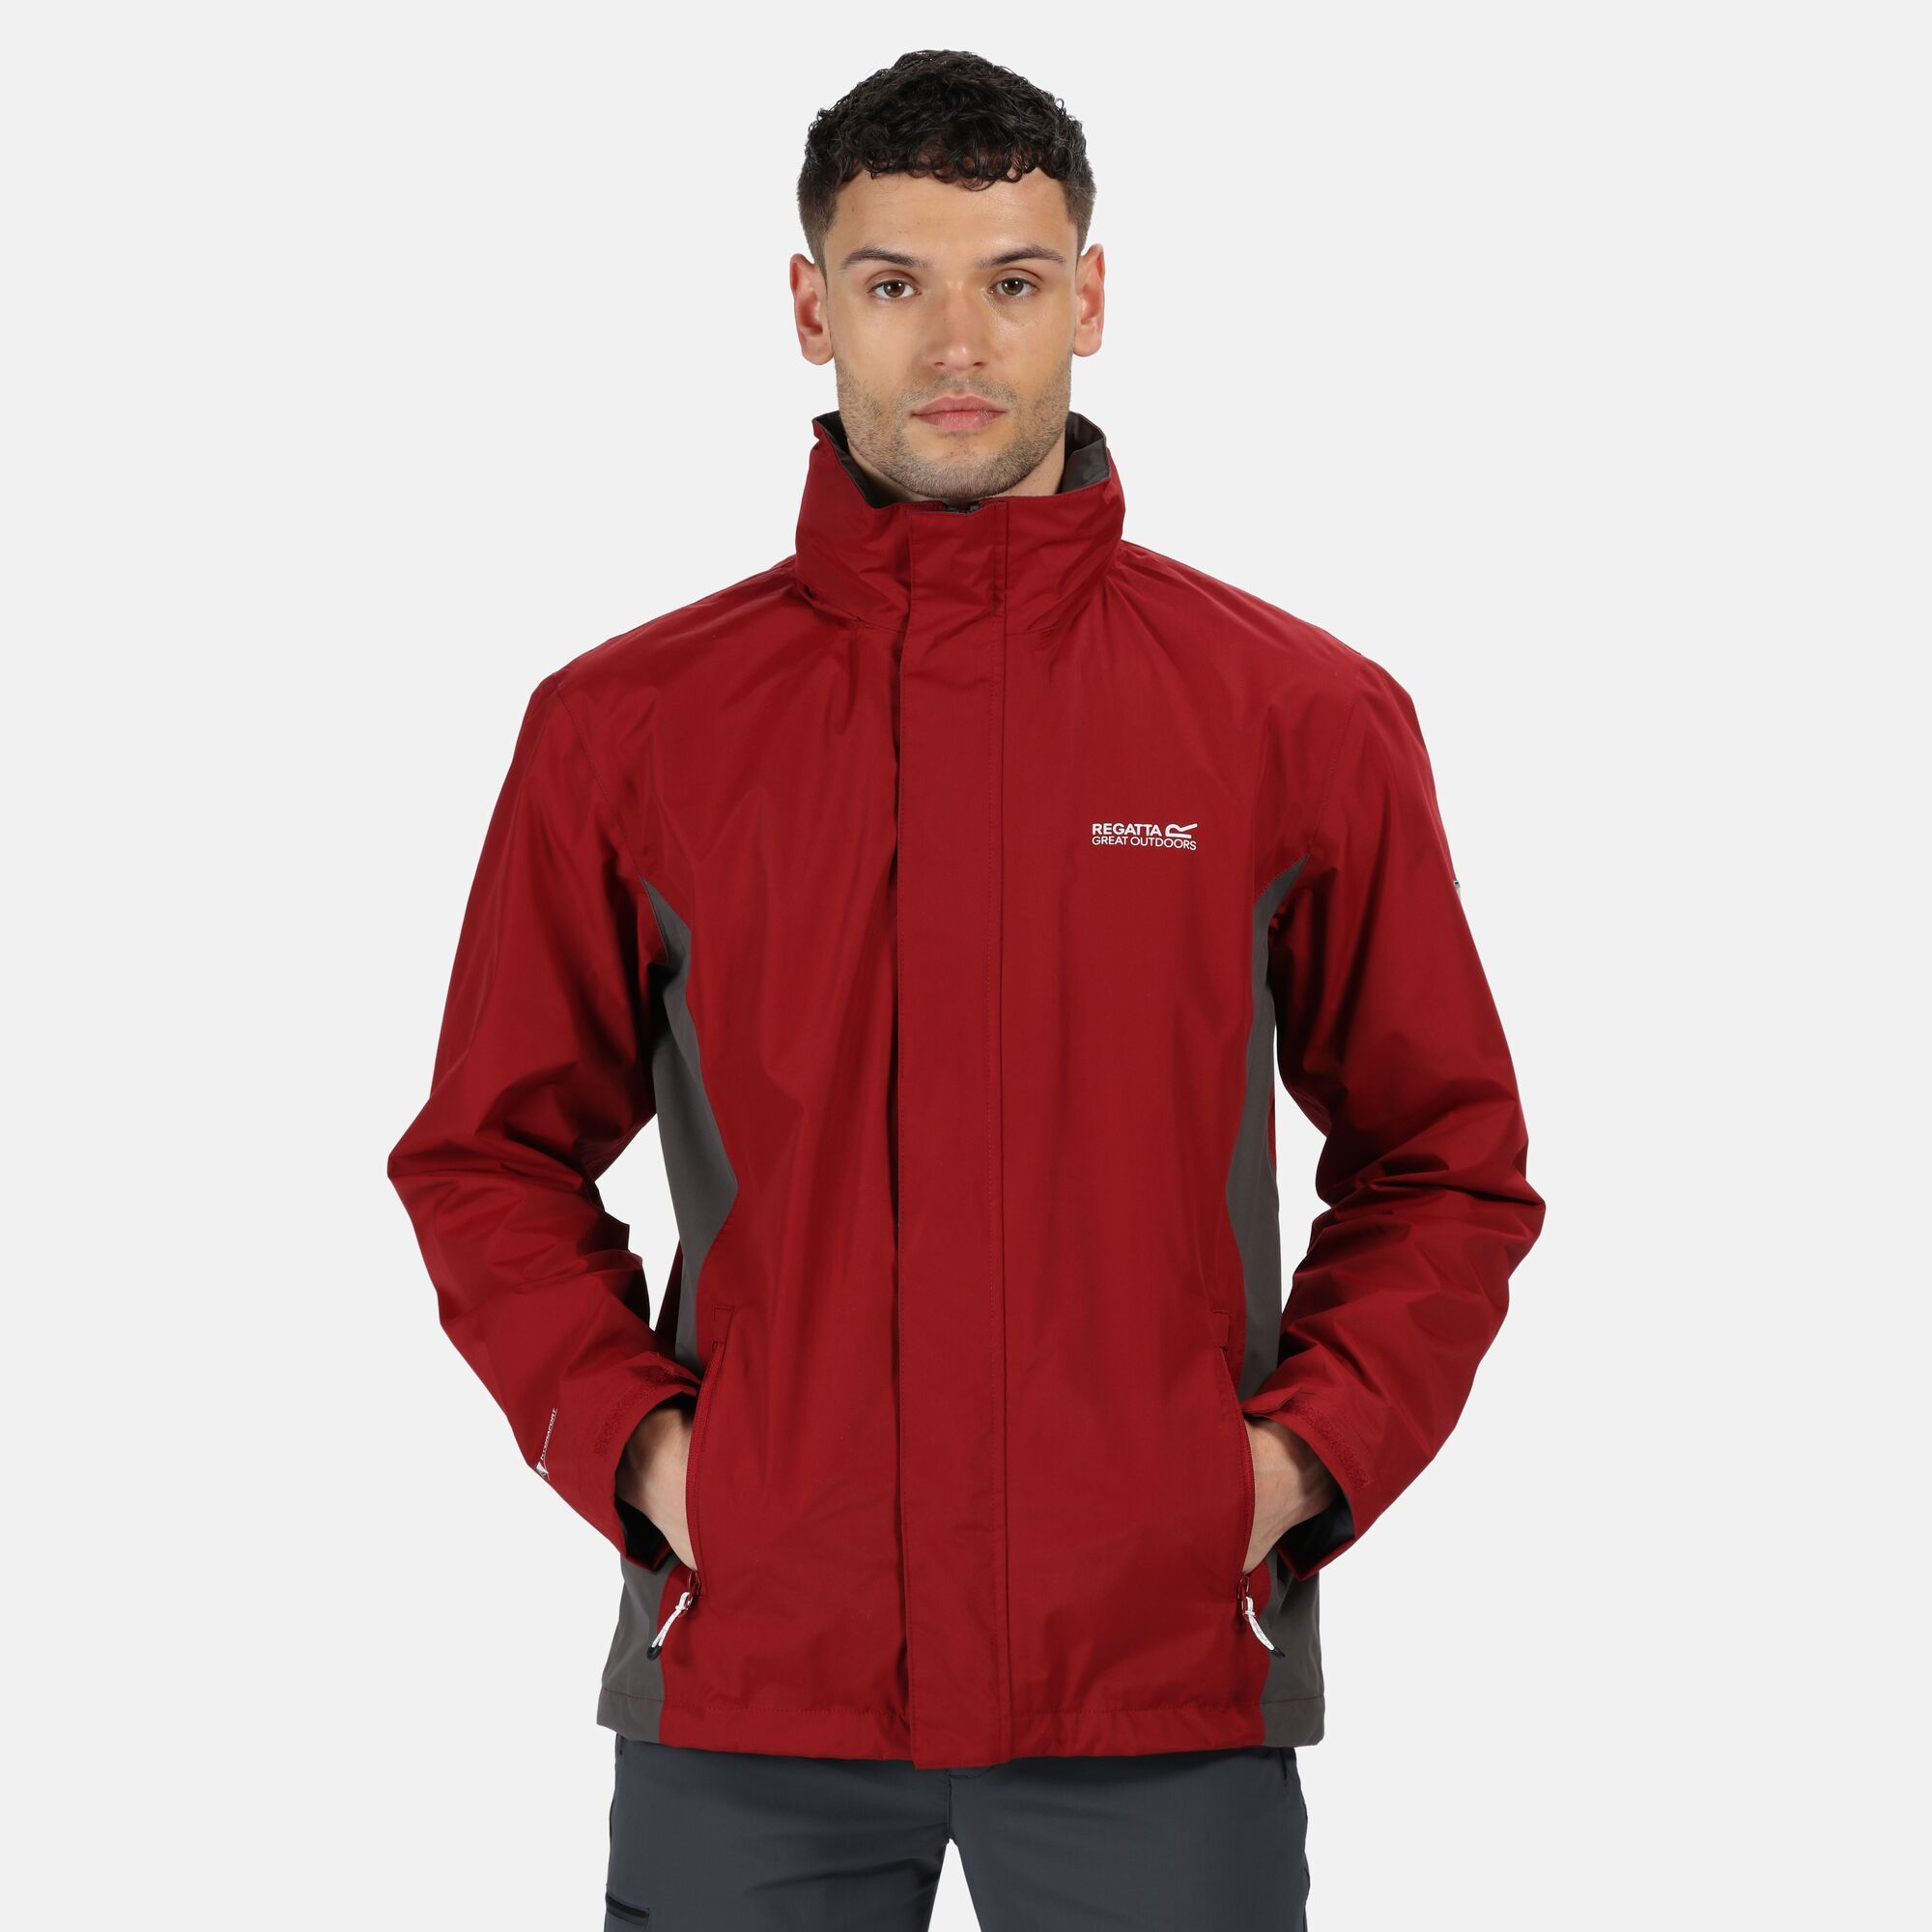 Regatta Great Outdoors Mens Jessup Waterproof Jacket (Delhi Red/Magnet Grey)